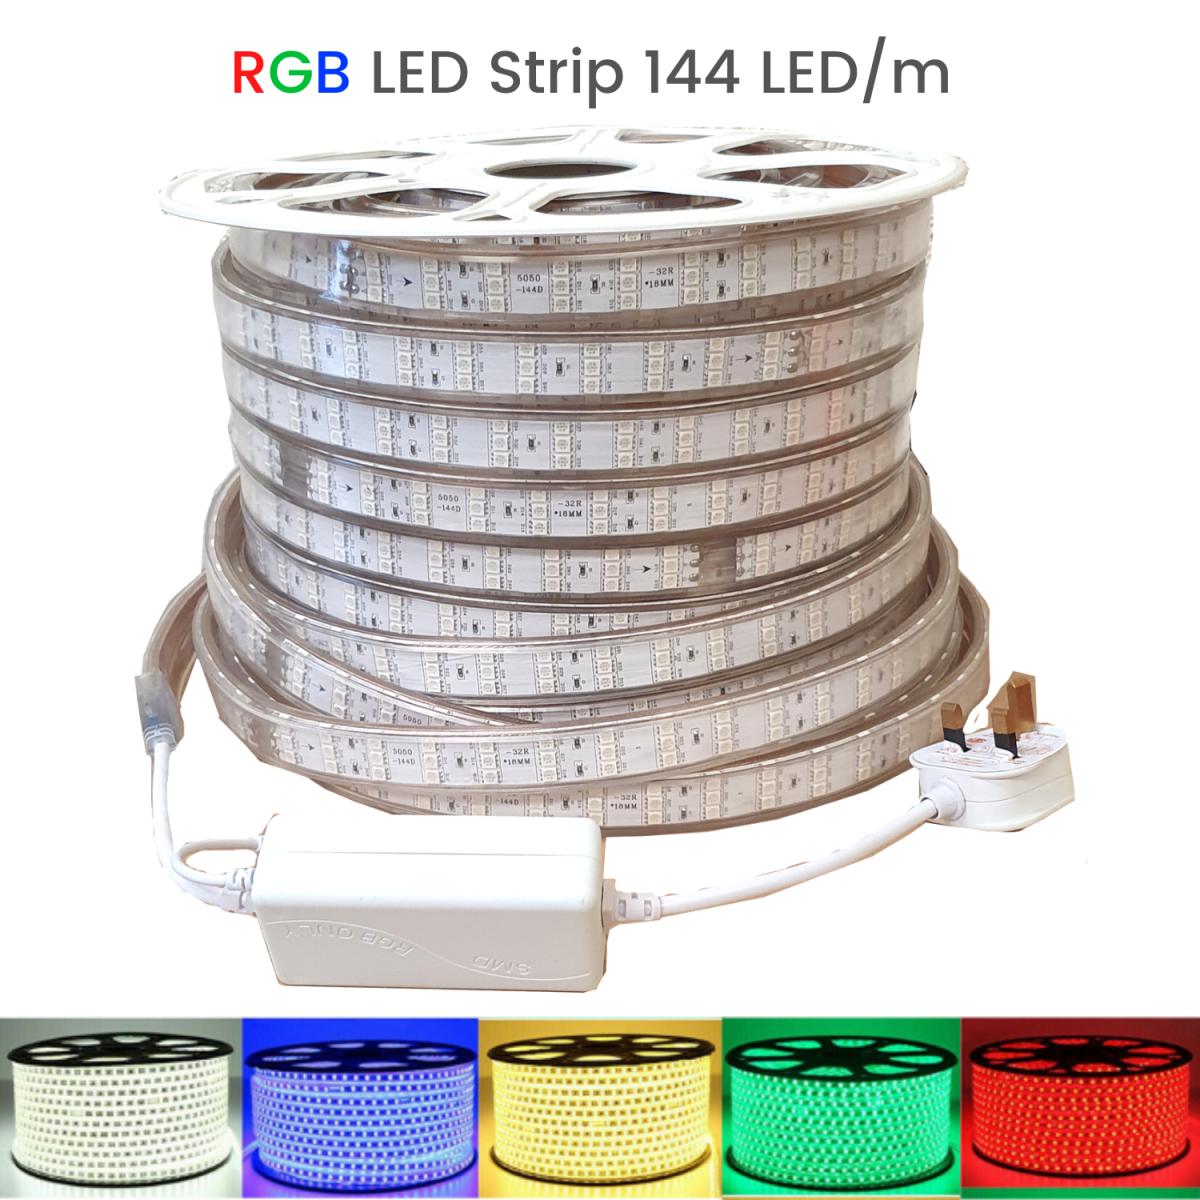 ATOM LED RGB LED STRIP 144 LED_m IP67 220V - www.ukledlights.co.uk